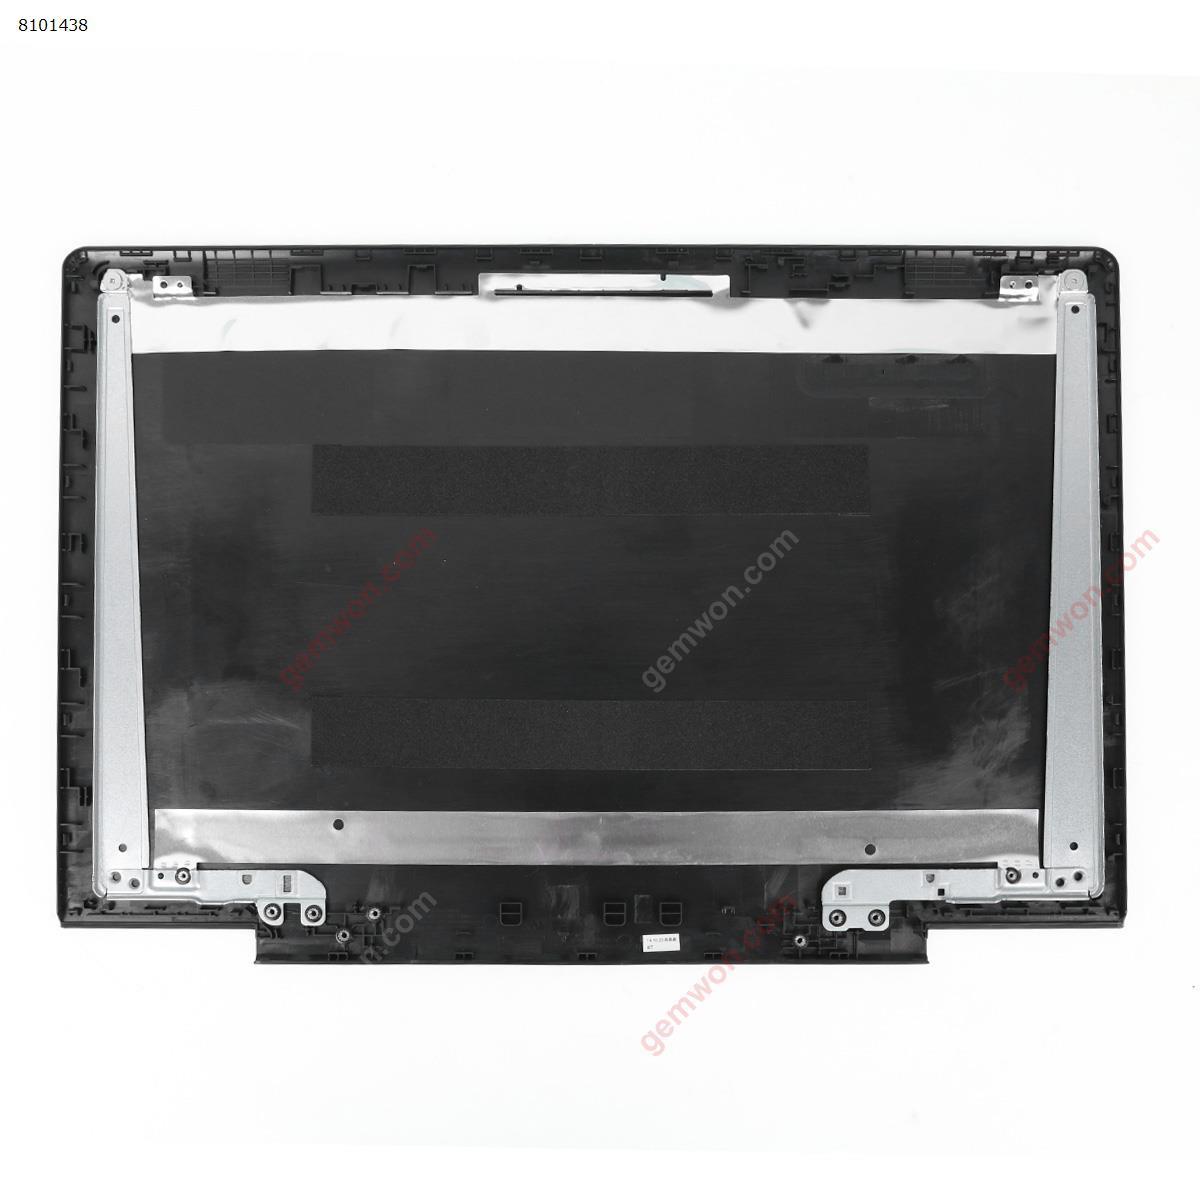 New Lenovo Ideapad 700-15ISK LCD Lid Back Cover Rear Top 8S5CB0K85923 Cover 8S5CB0K85923